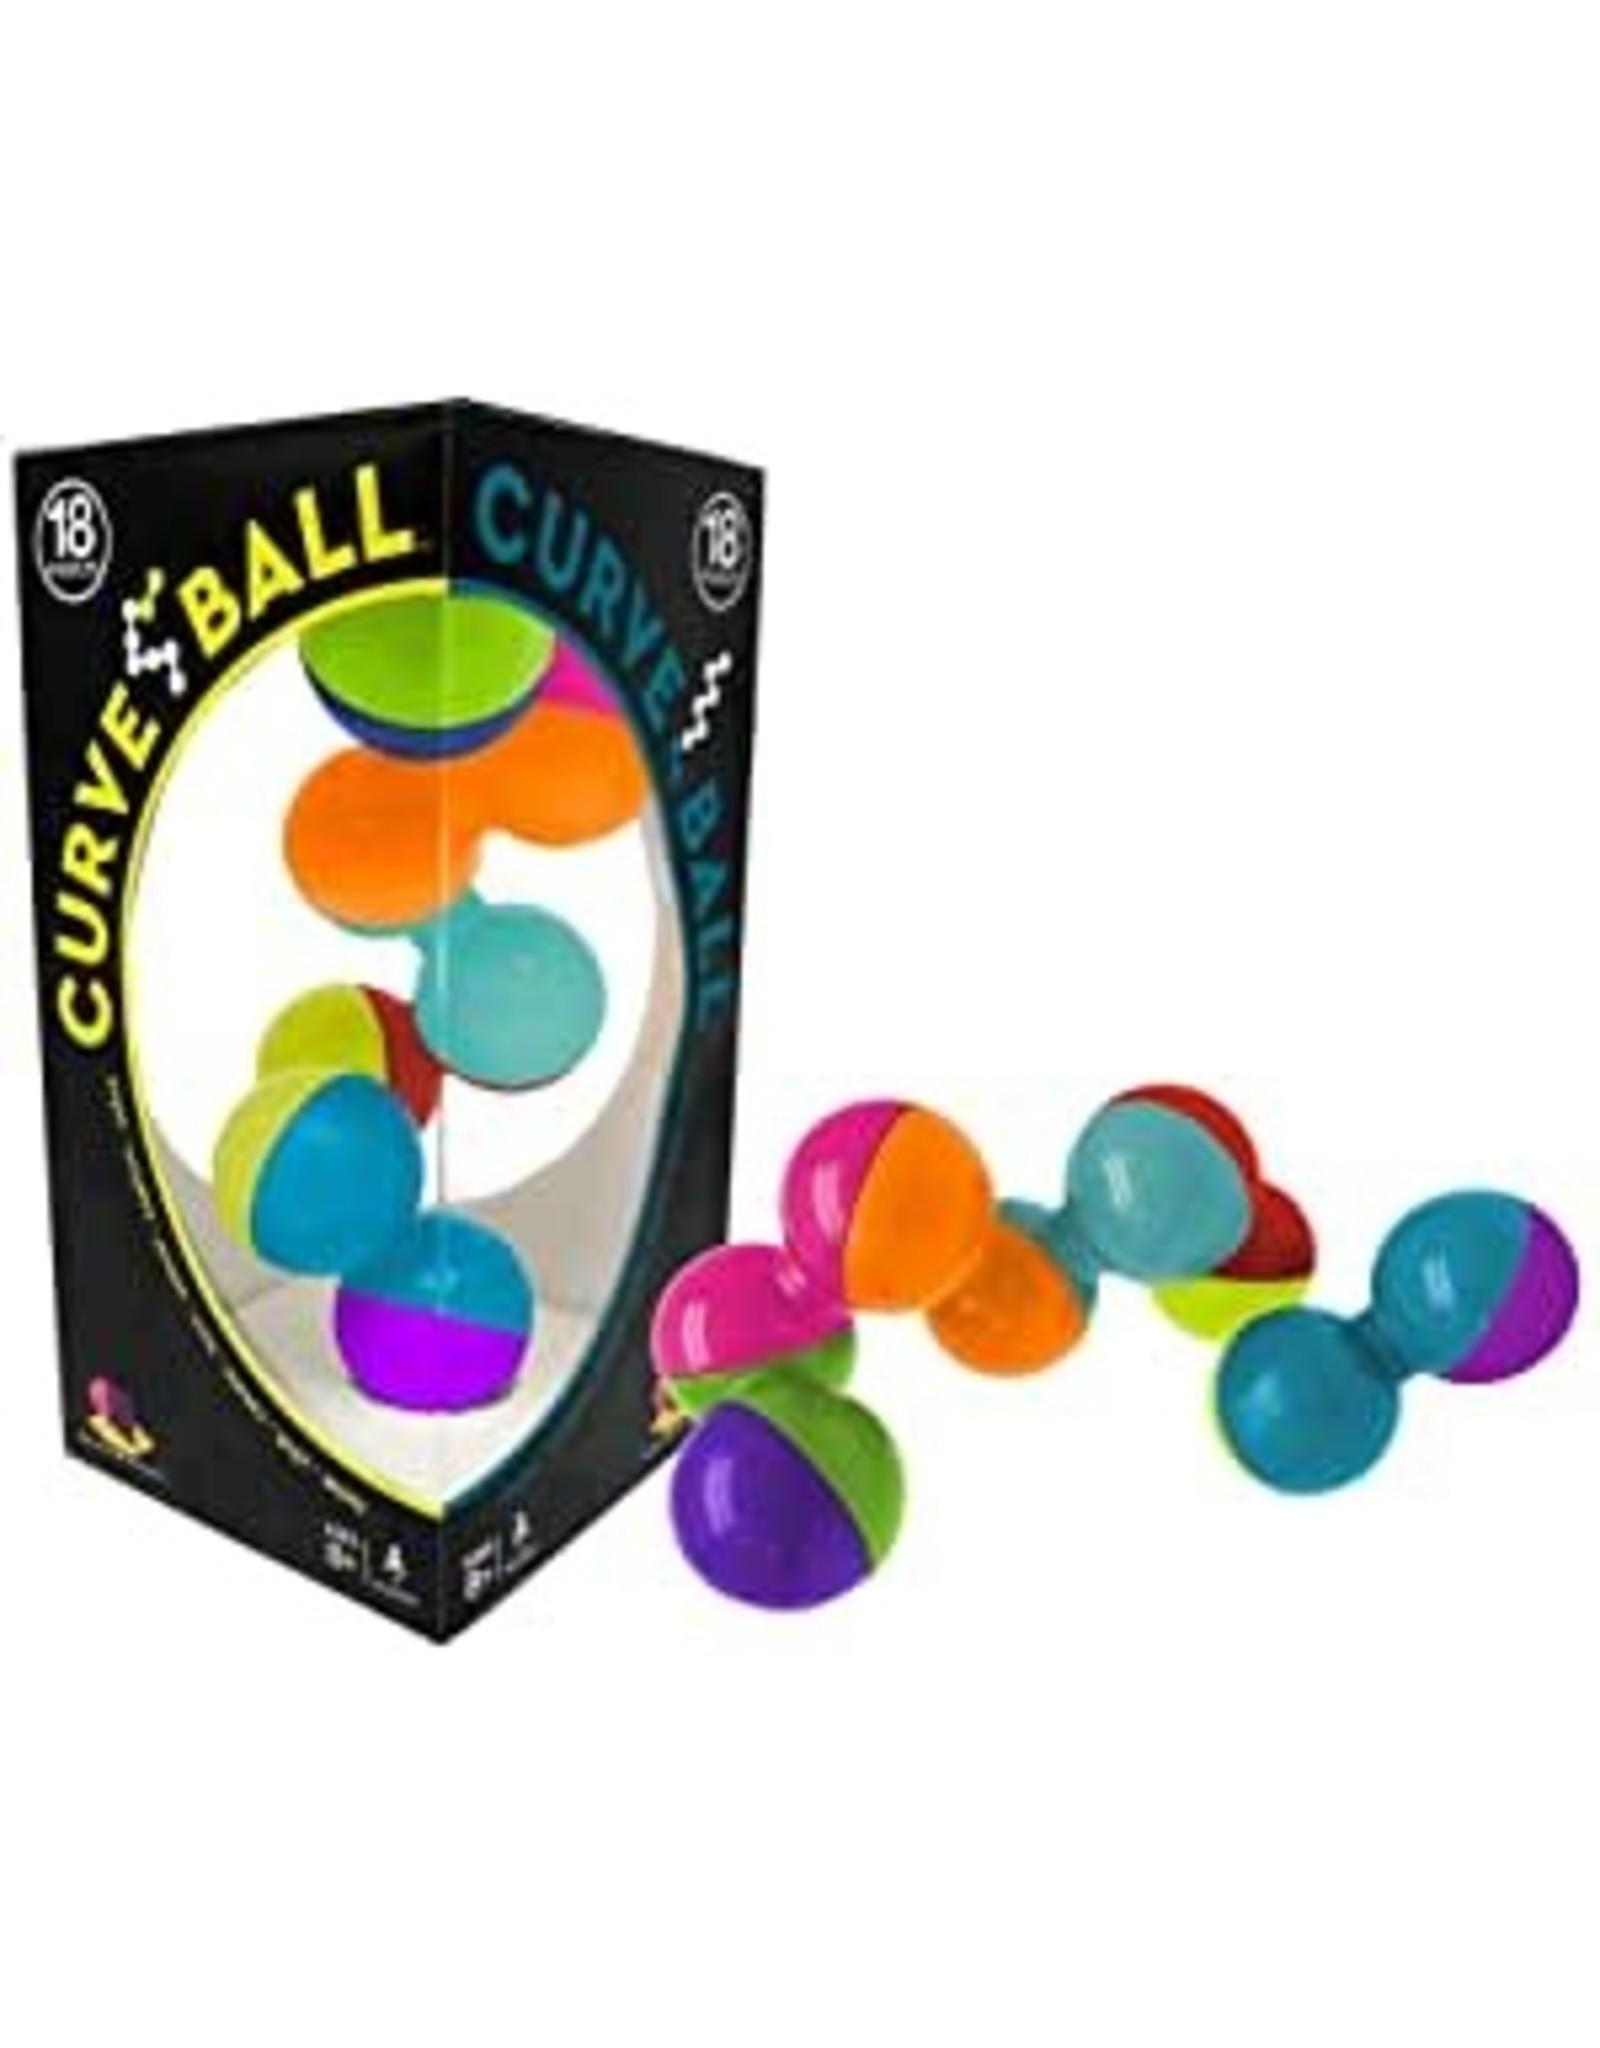 brainwright curve ball 8314